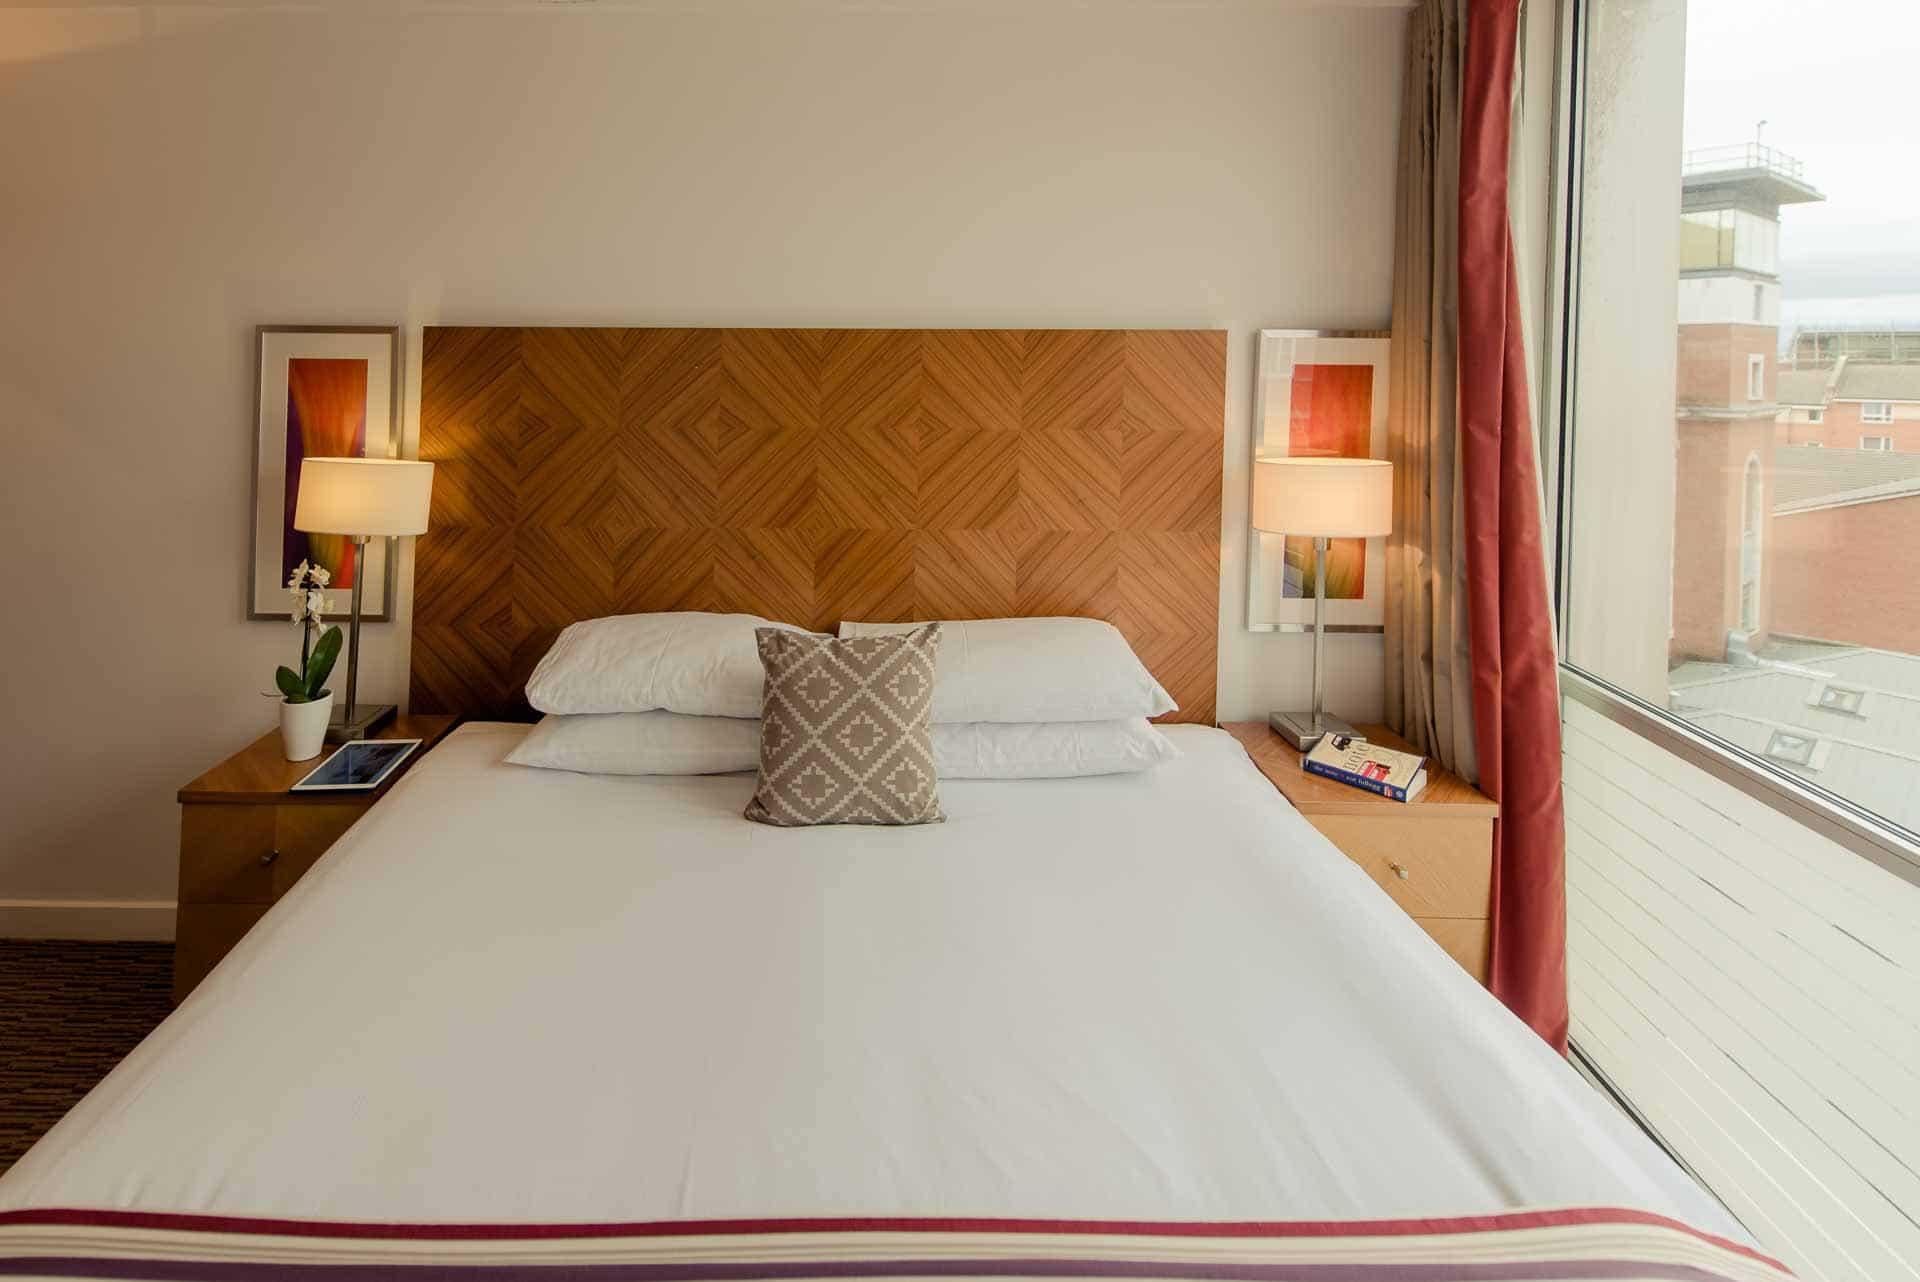 Double bed at Premier Suites Liverpool, Centre, Liverpool - Citybase Apartments